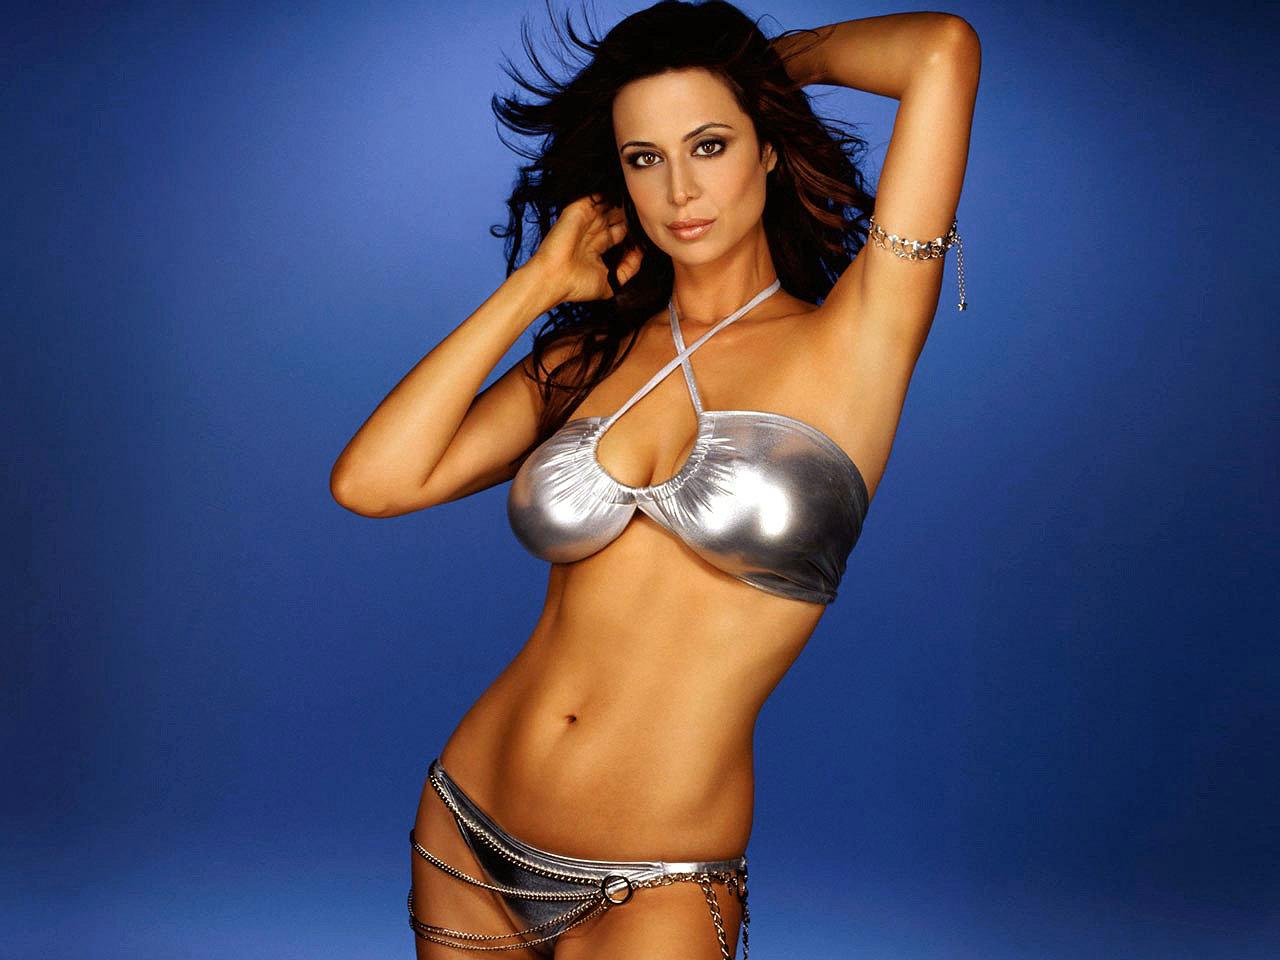 http://1.bp.blogspot.com/_eaztLnmCbGo/TMQejZZWDZI/AAAAAAAAAEc/qHcNGt-Mzxo/s1600/Catherine+Bell.jpg